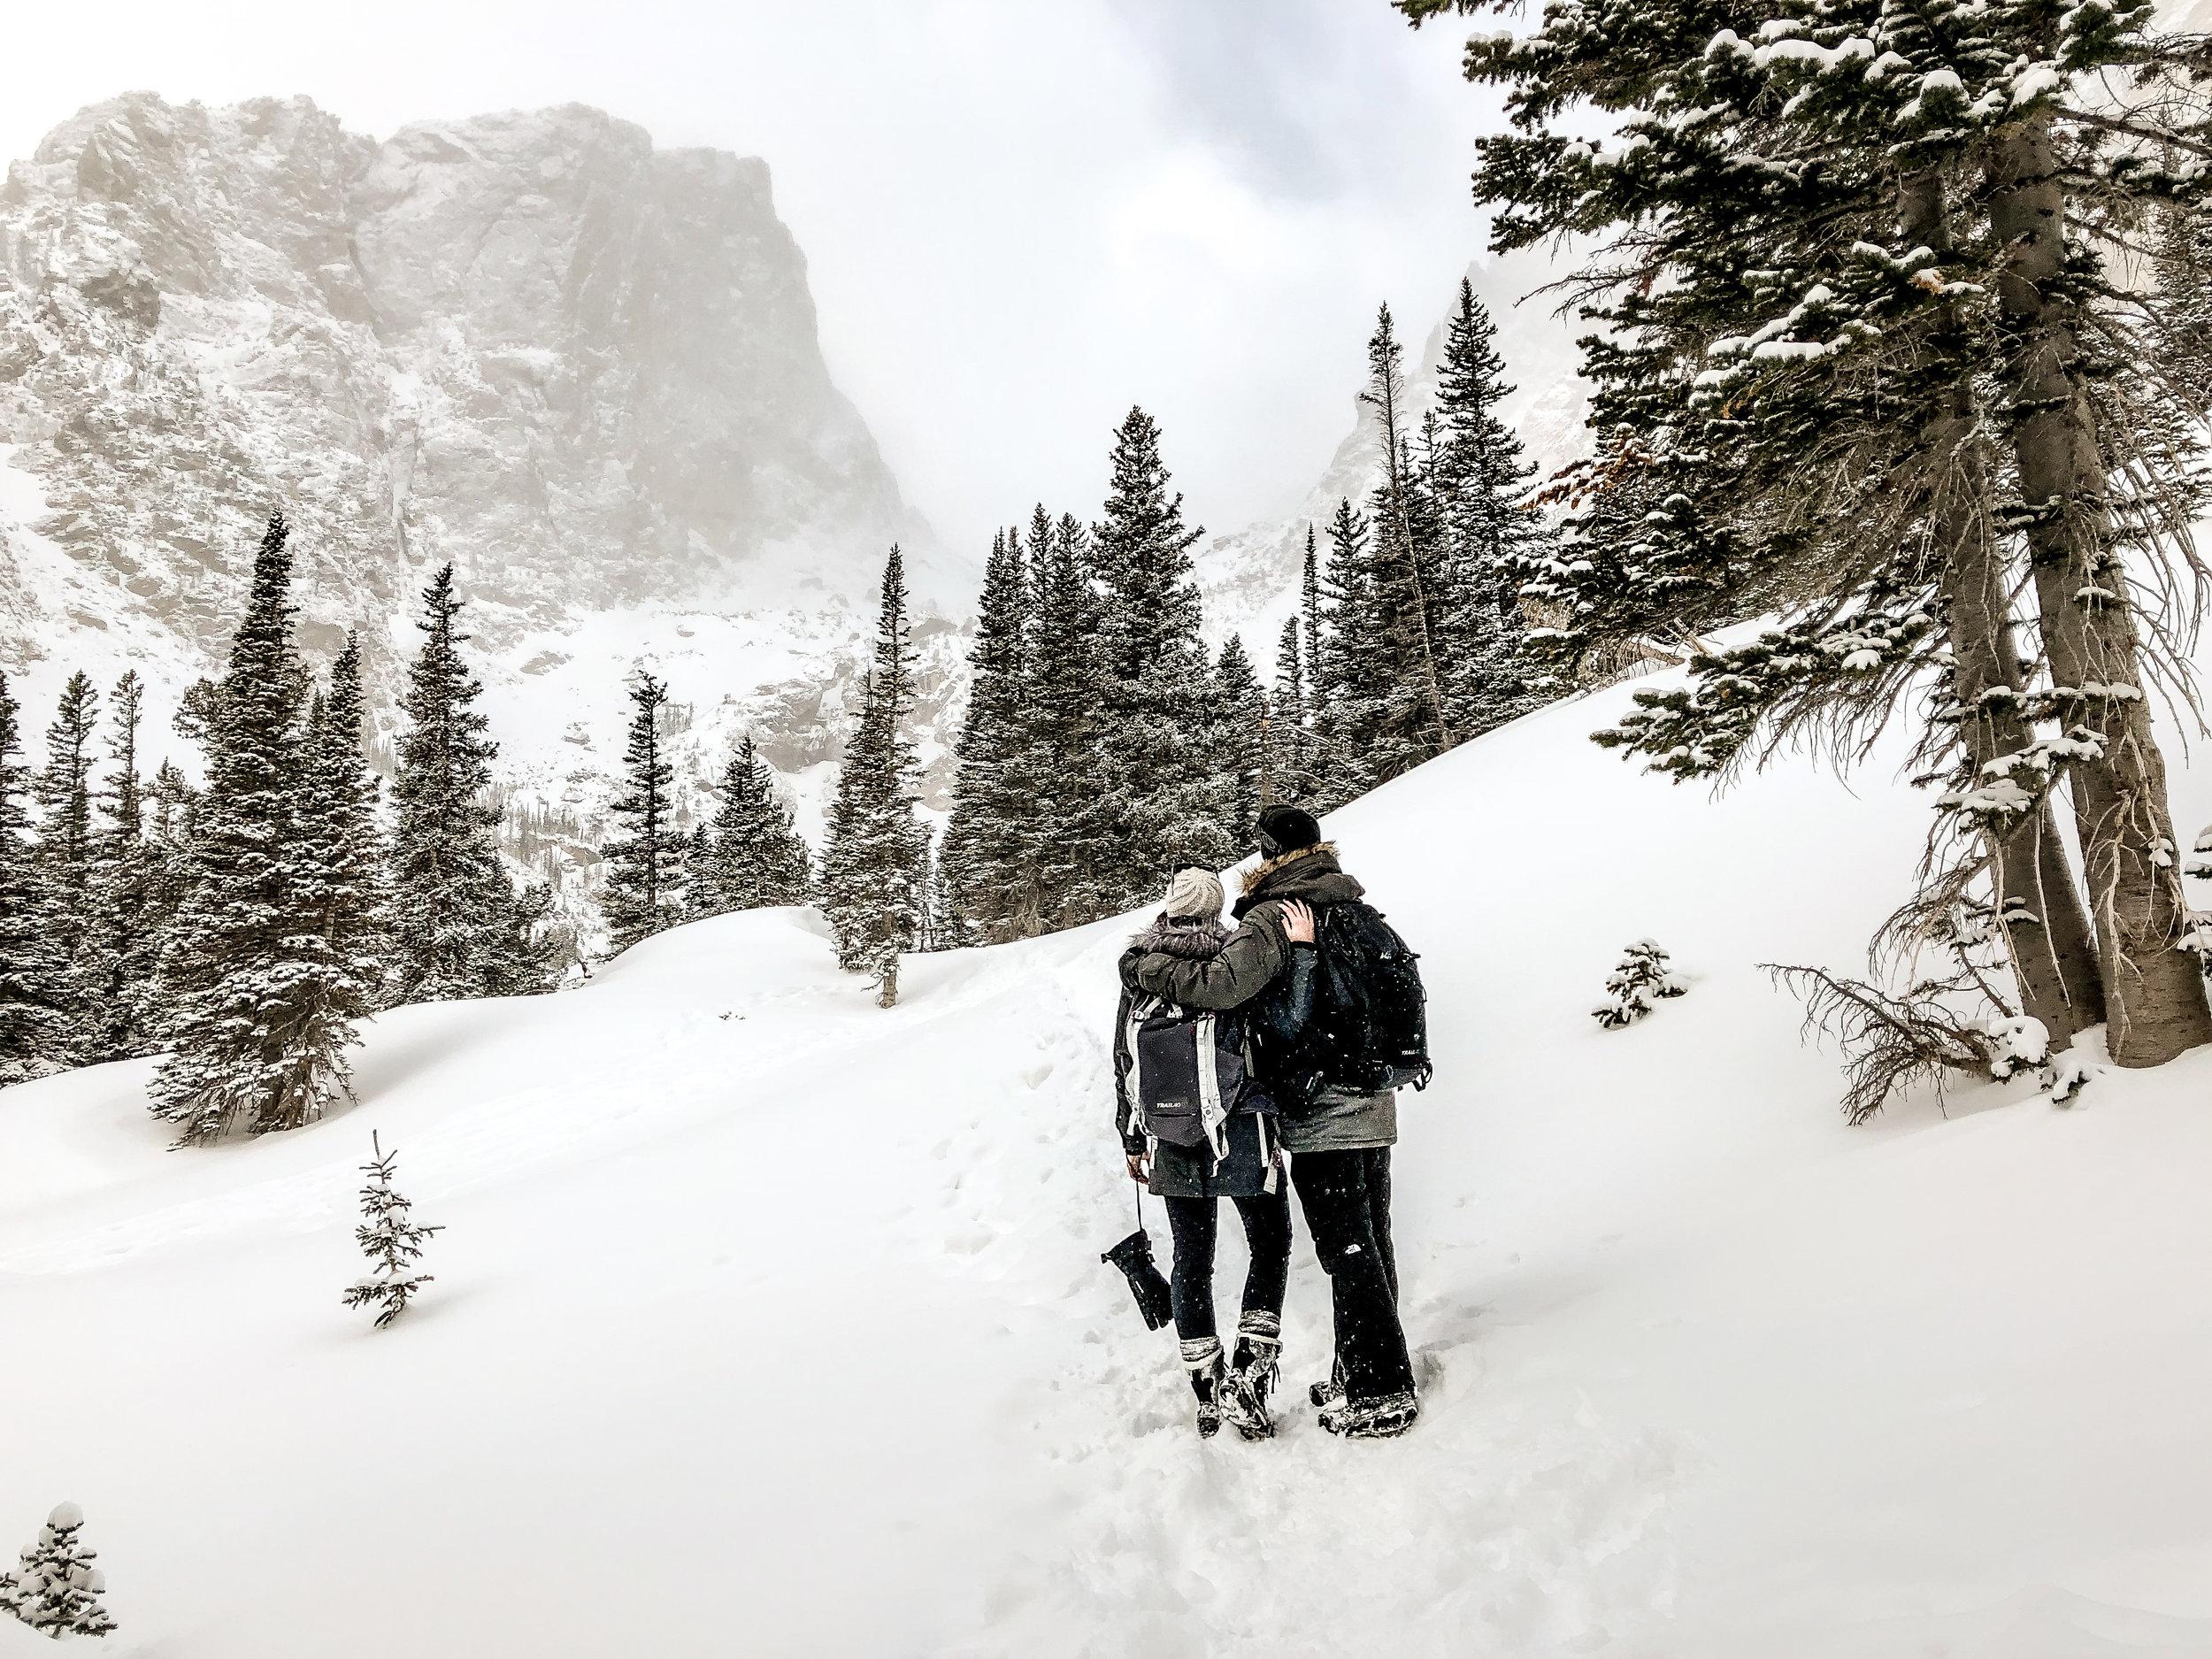 Taking in those Colorado views!